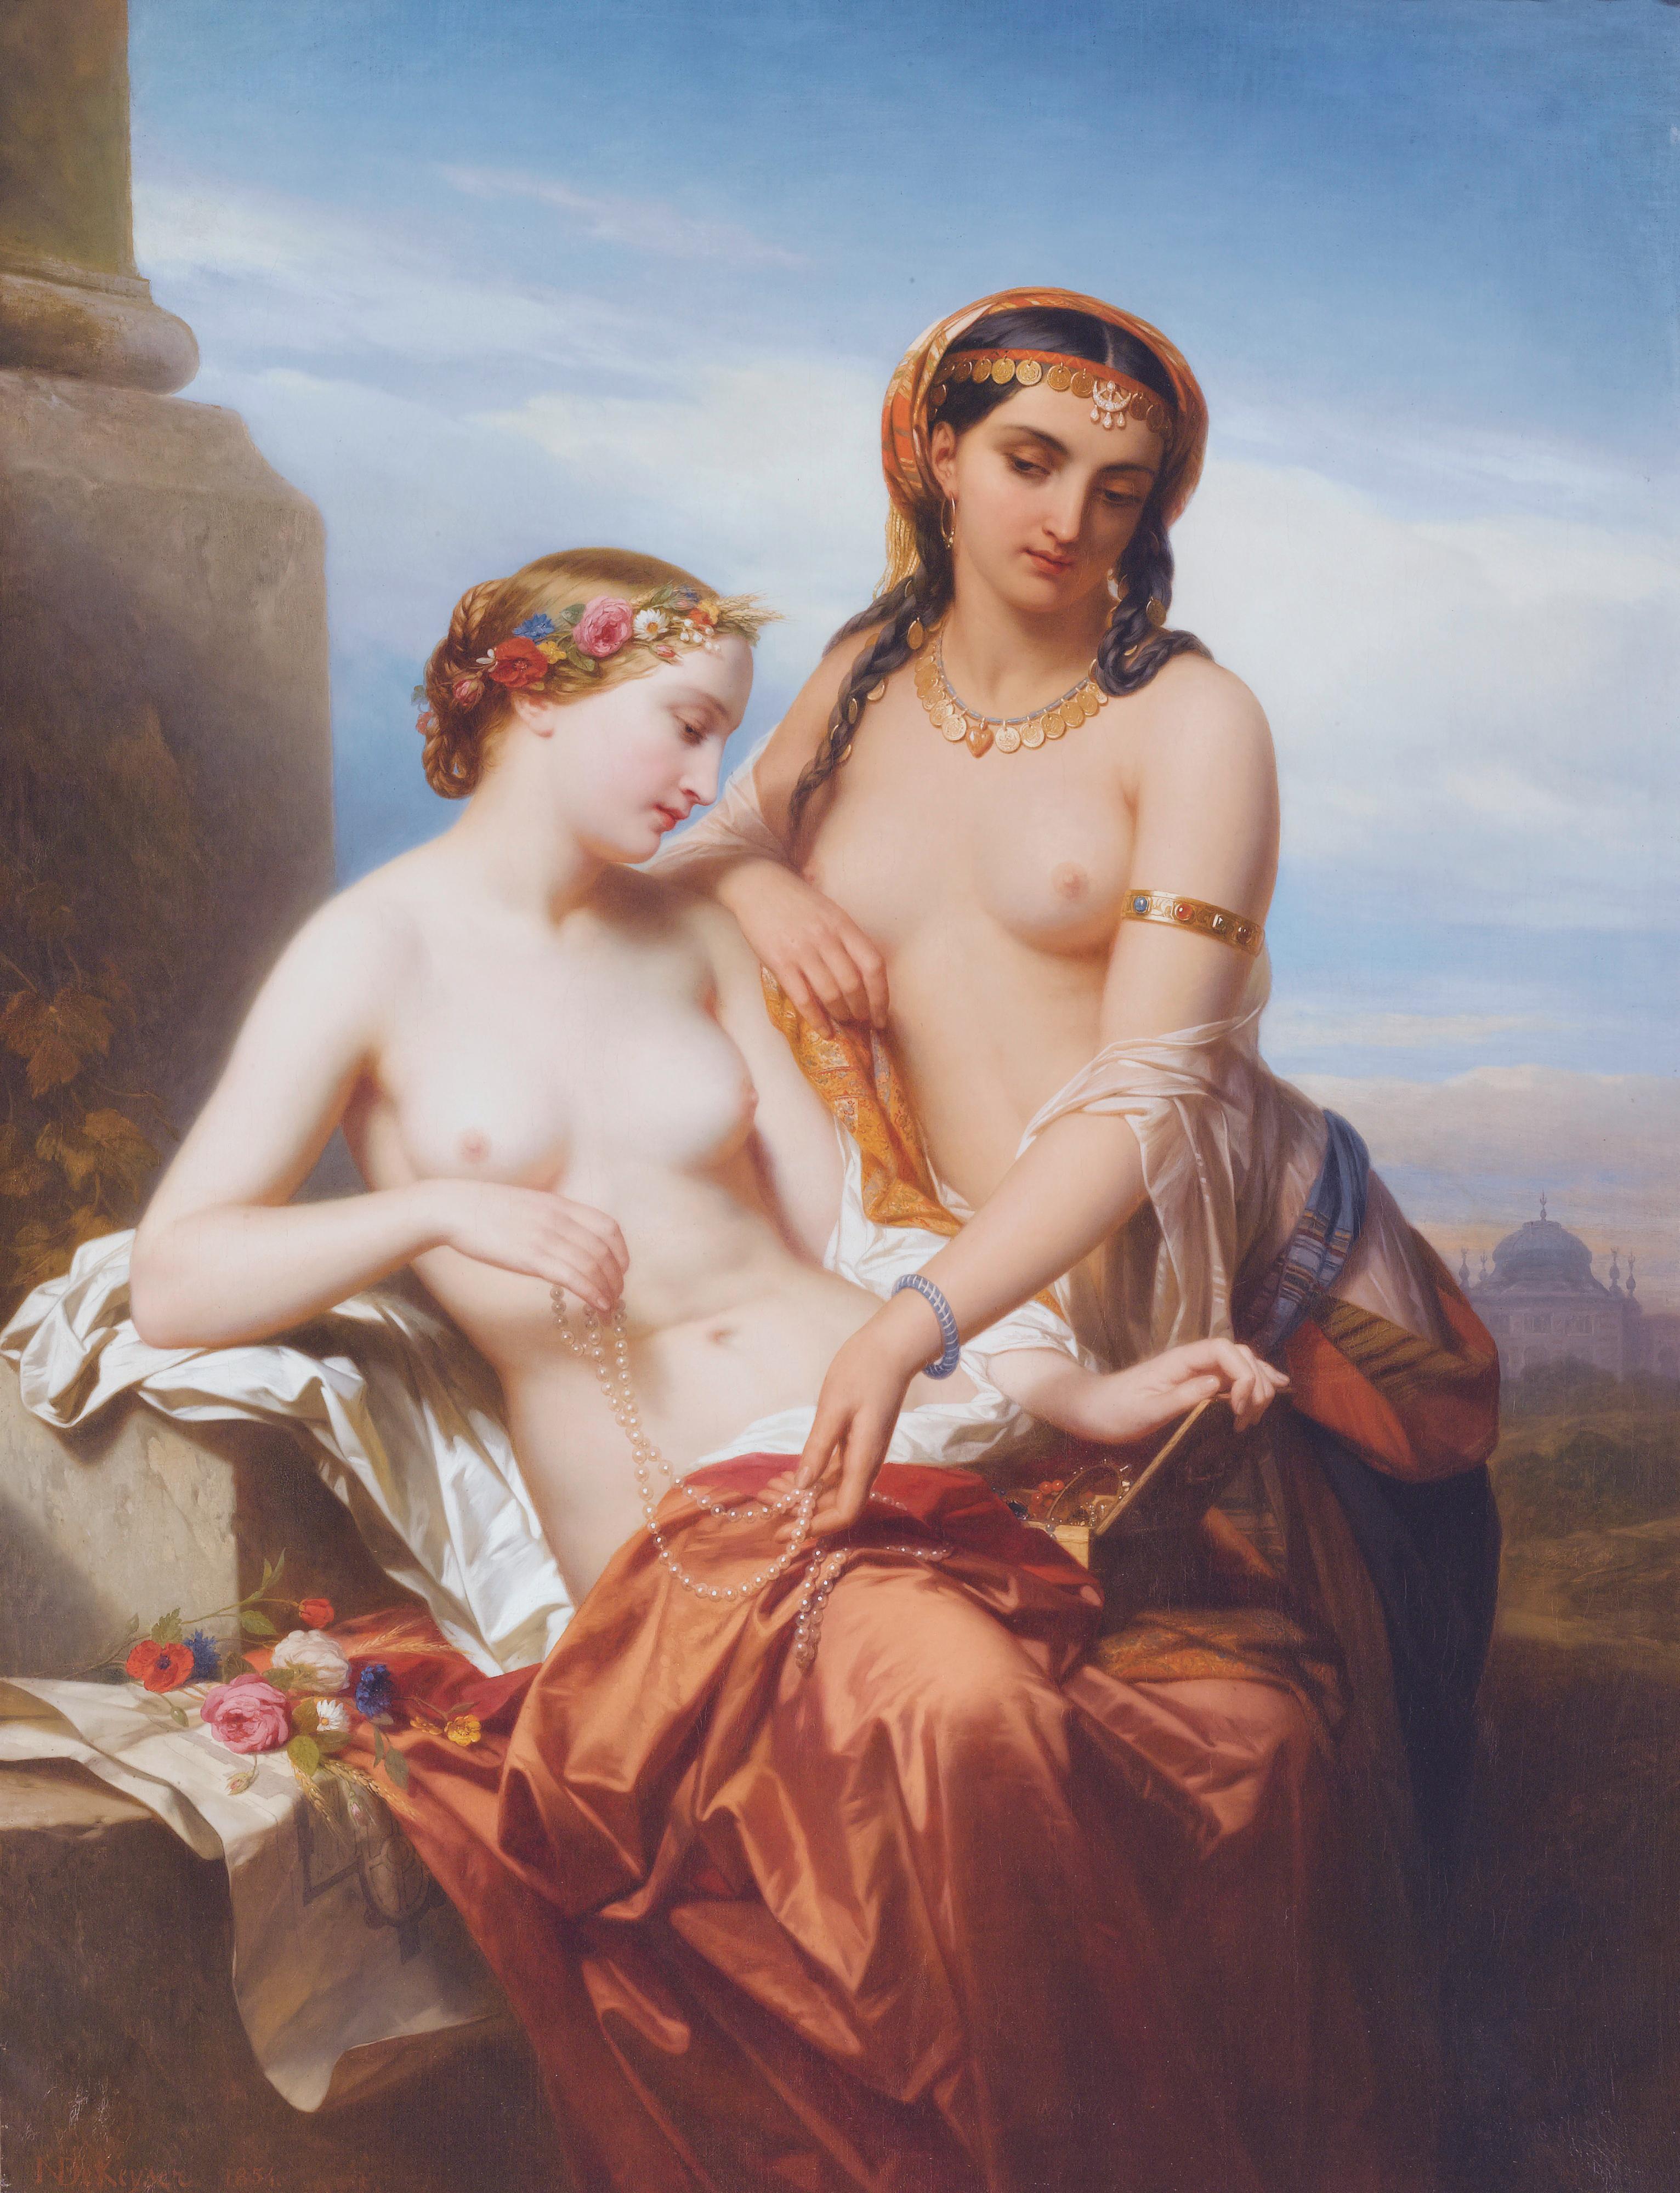 alleged historical sex offen - HD950×1258